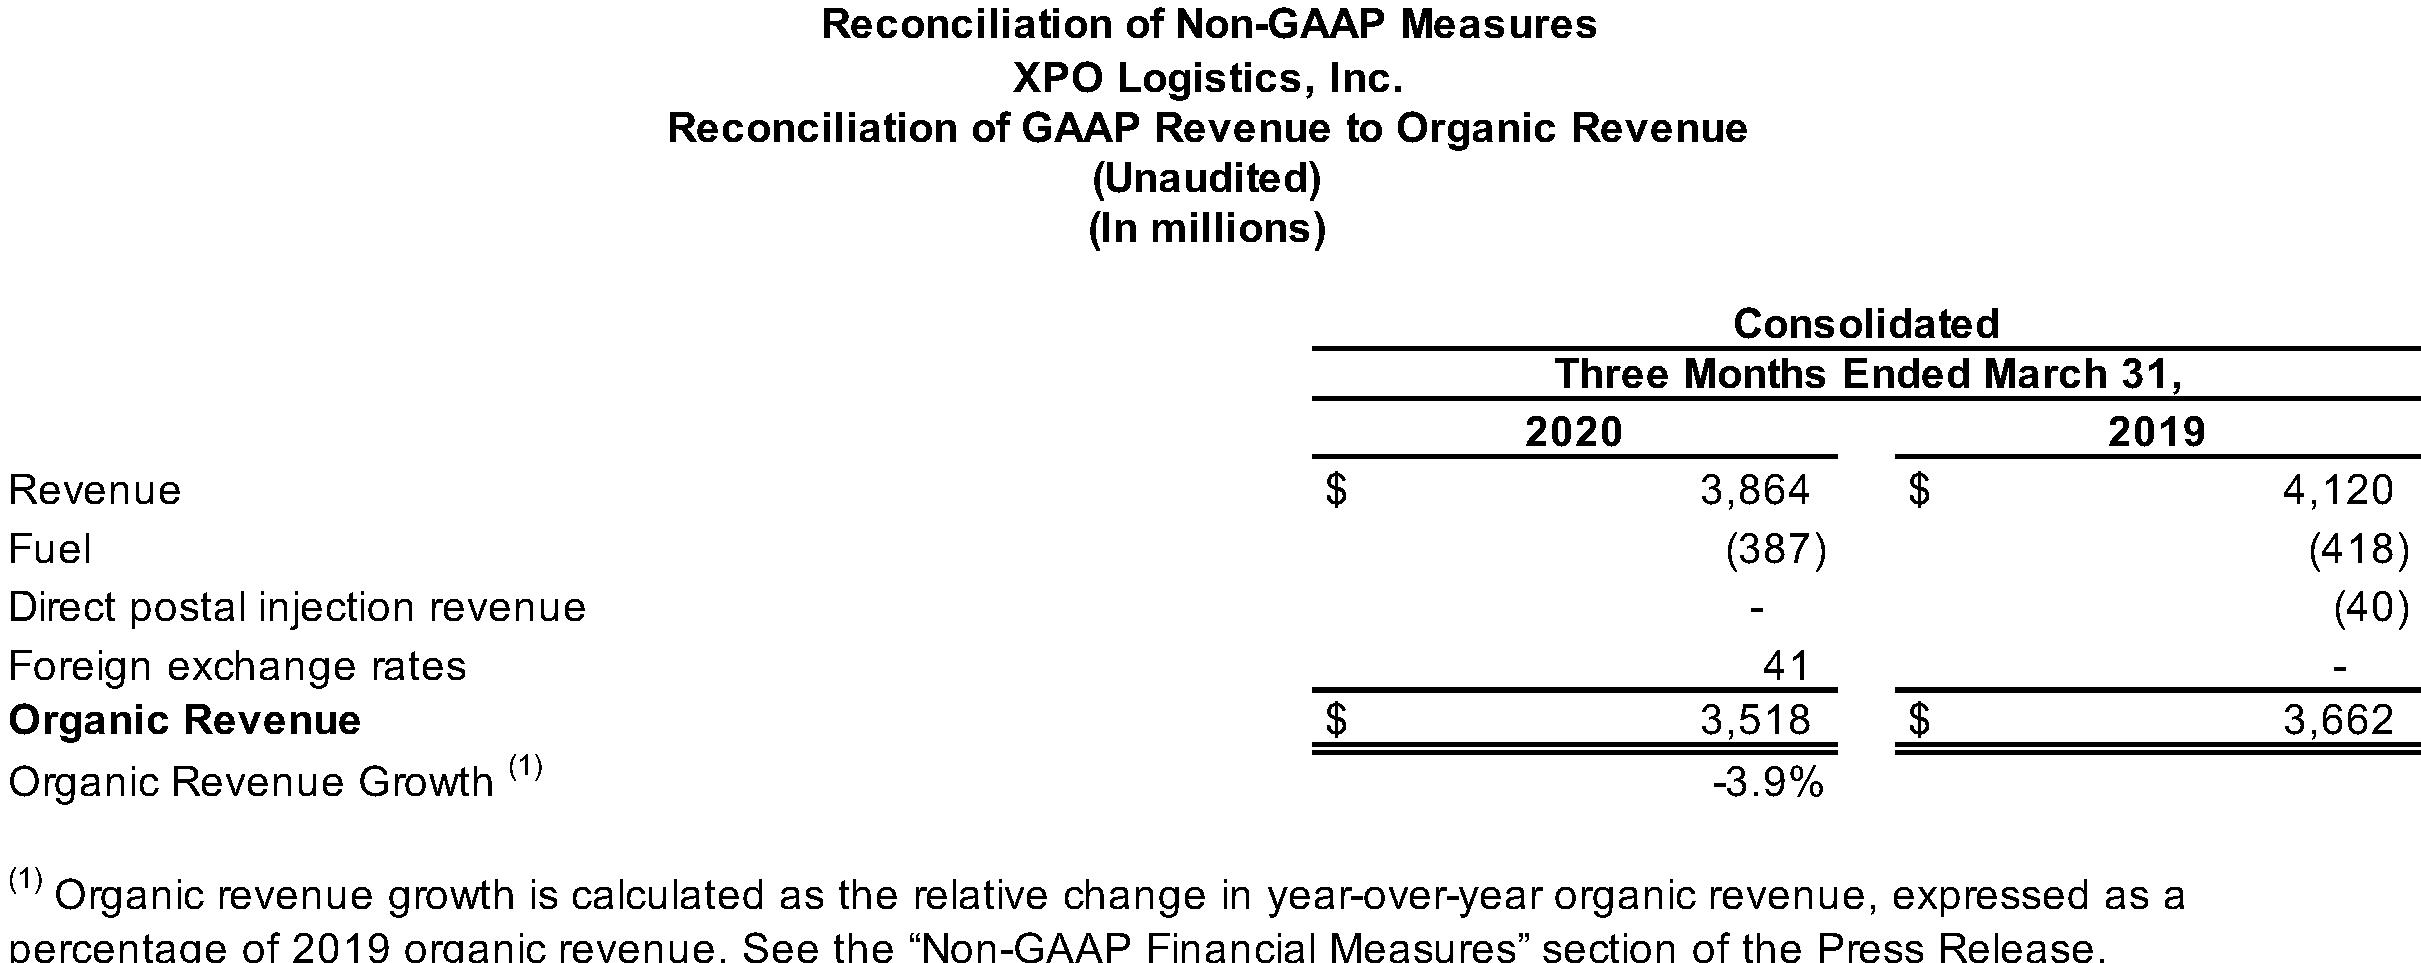 Reconciliation of GAAP Revenue to Organic Revenue